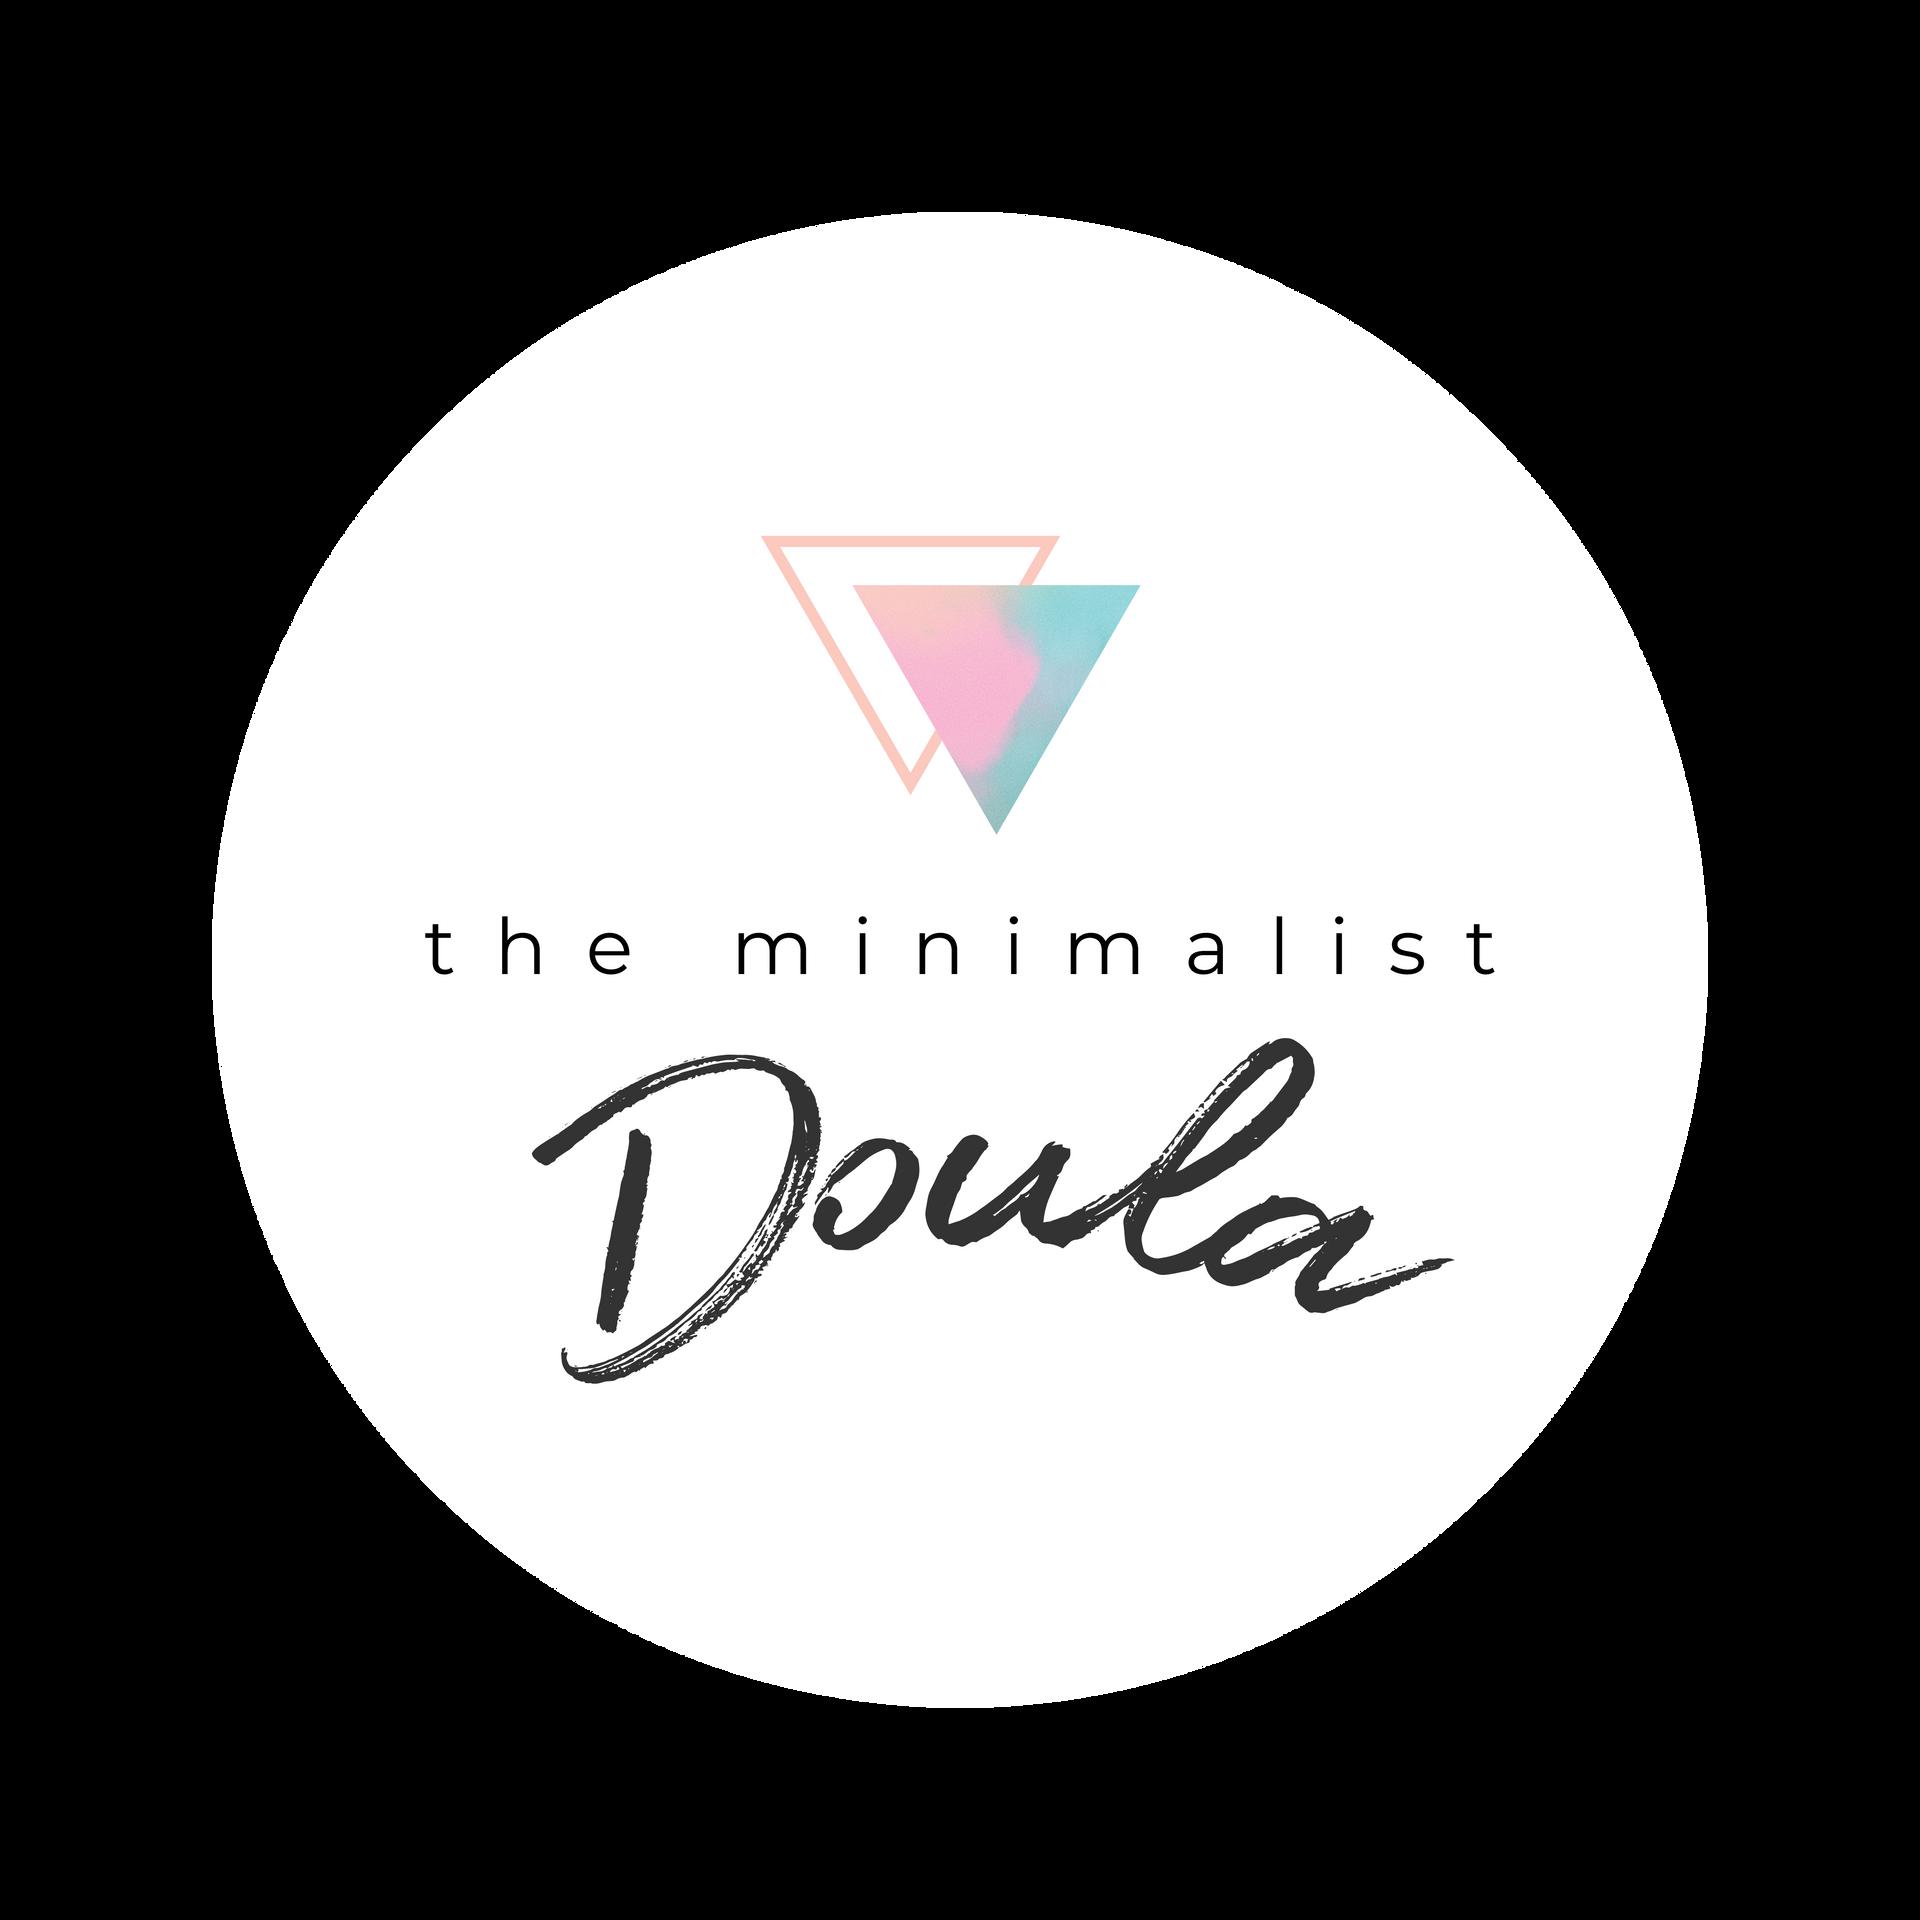 Doula Branding | Brand Identity Design by Fresh Leaf Creative